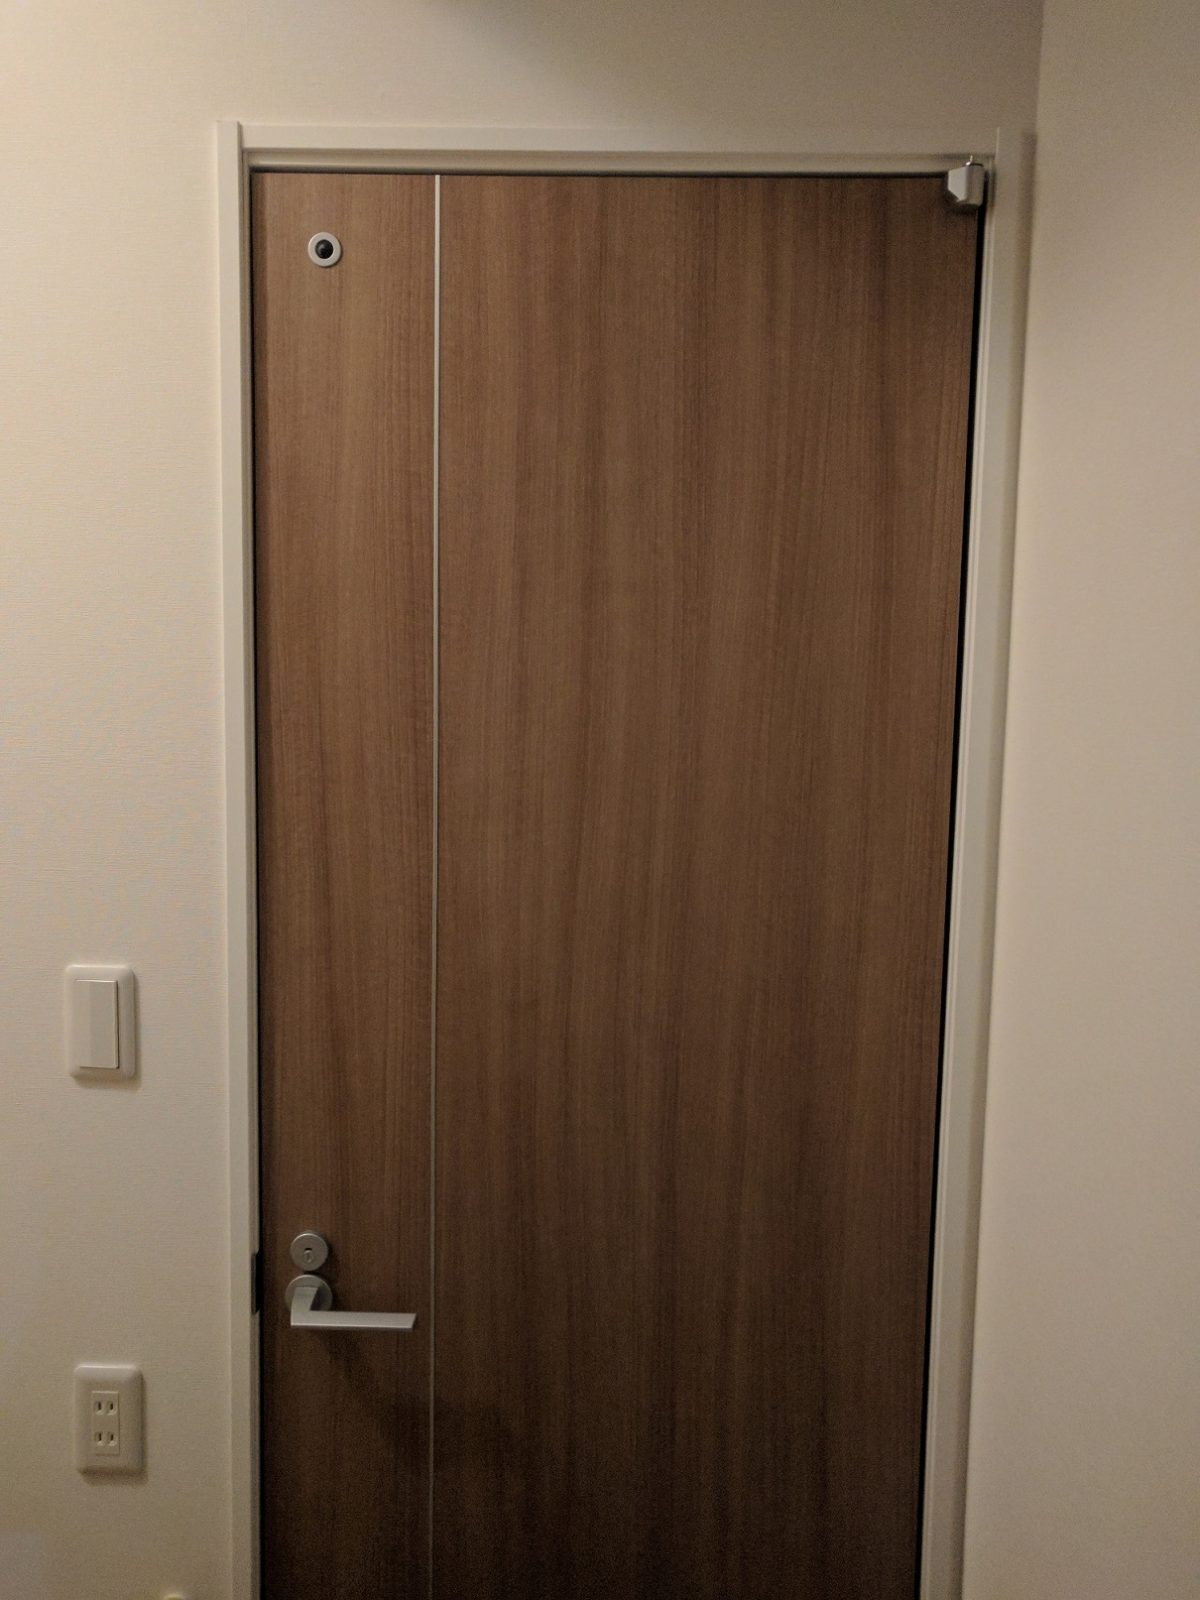 i-smart《グレーウォールナットの扉》部屋・トイレ用